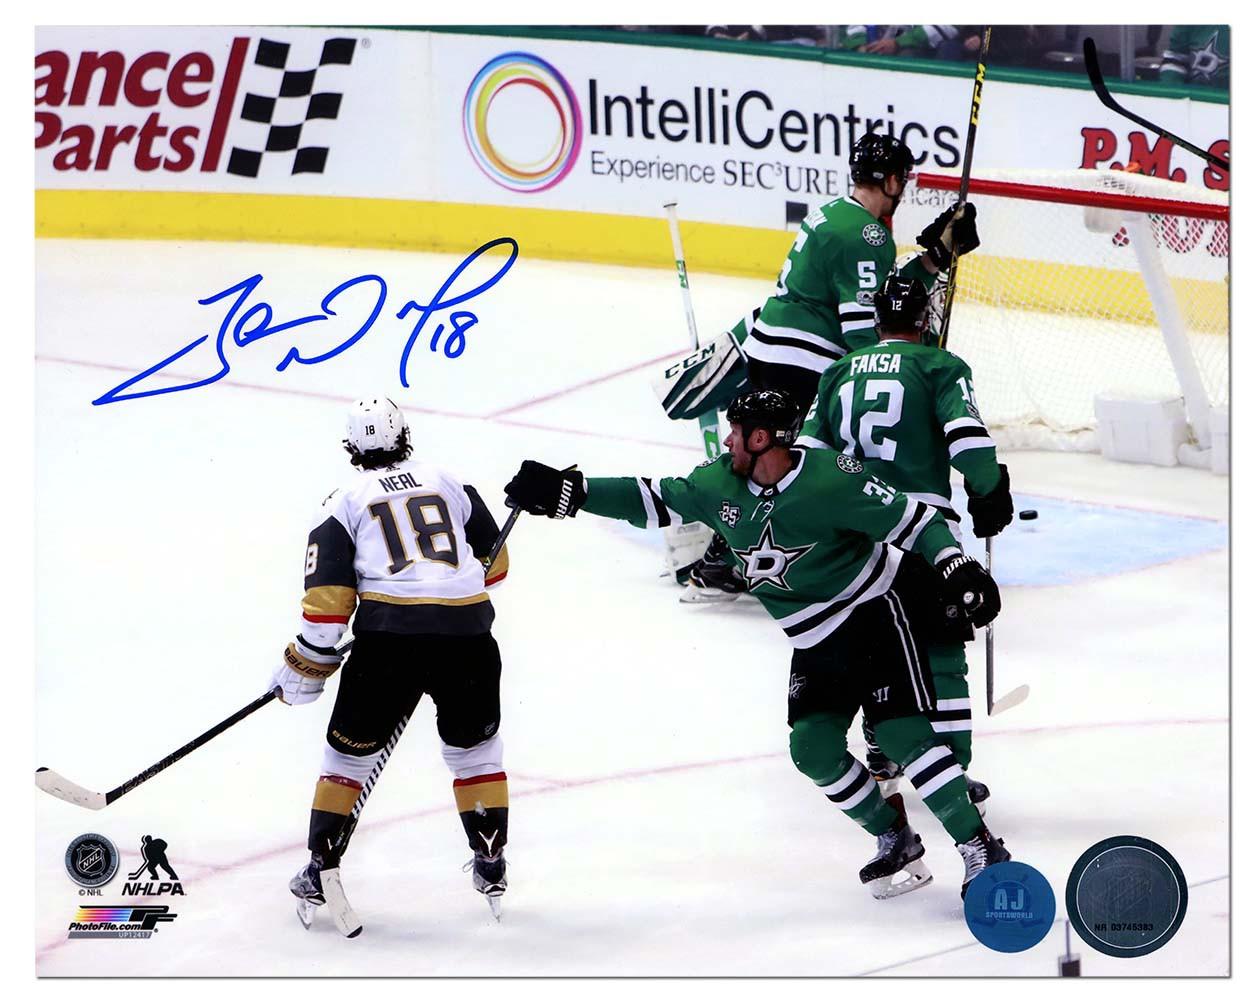 James Neal Vegas Golden Knights Autographed Signed 1st Vegas Goal 8x10  Photo - Certified Authentic 1d7192d0c